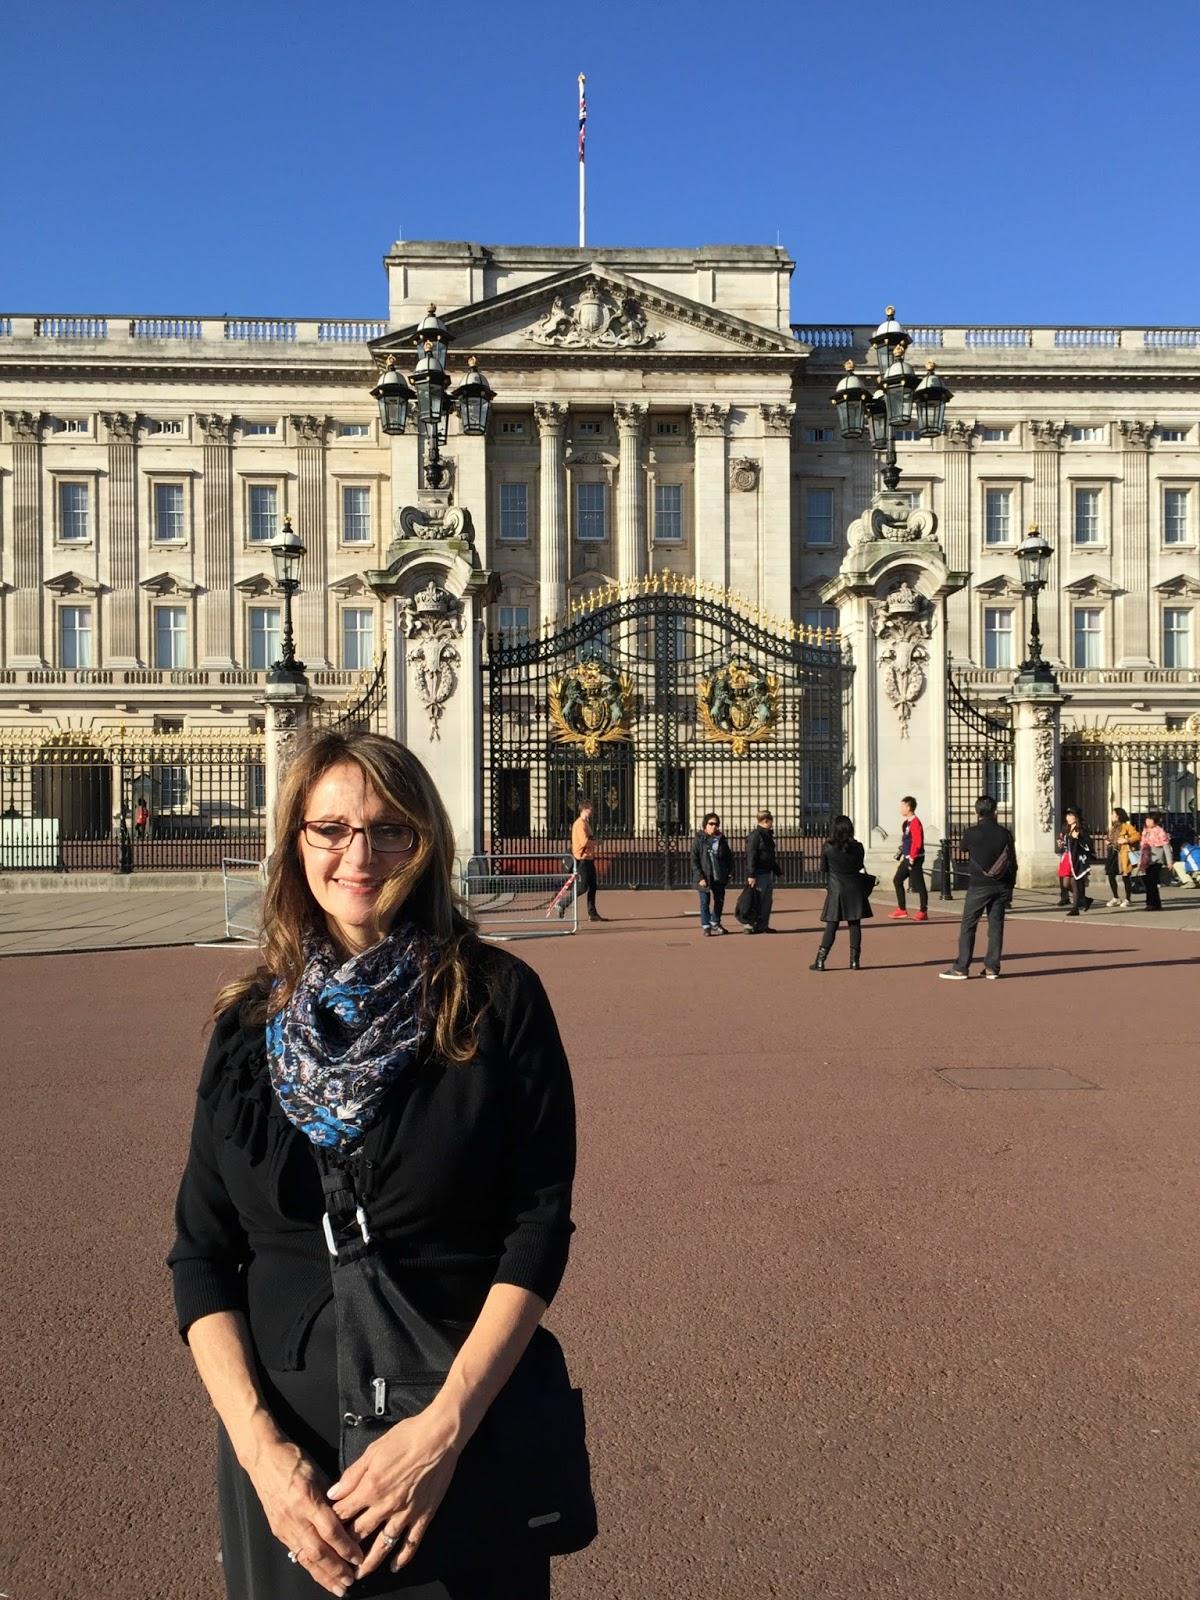 Donu0027t miss Buckingham Palace u0026 The Royal